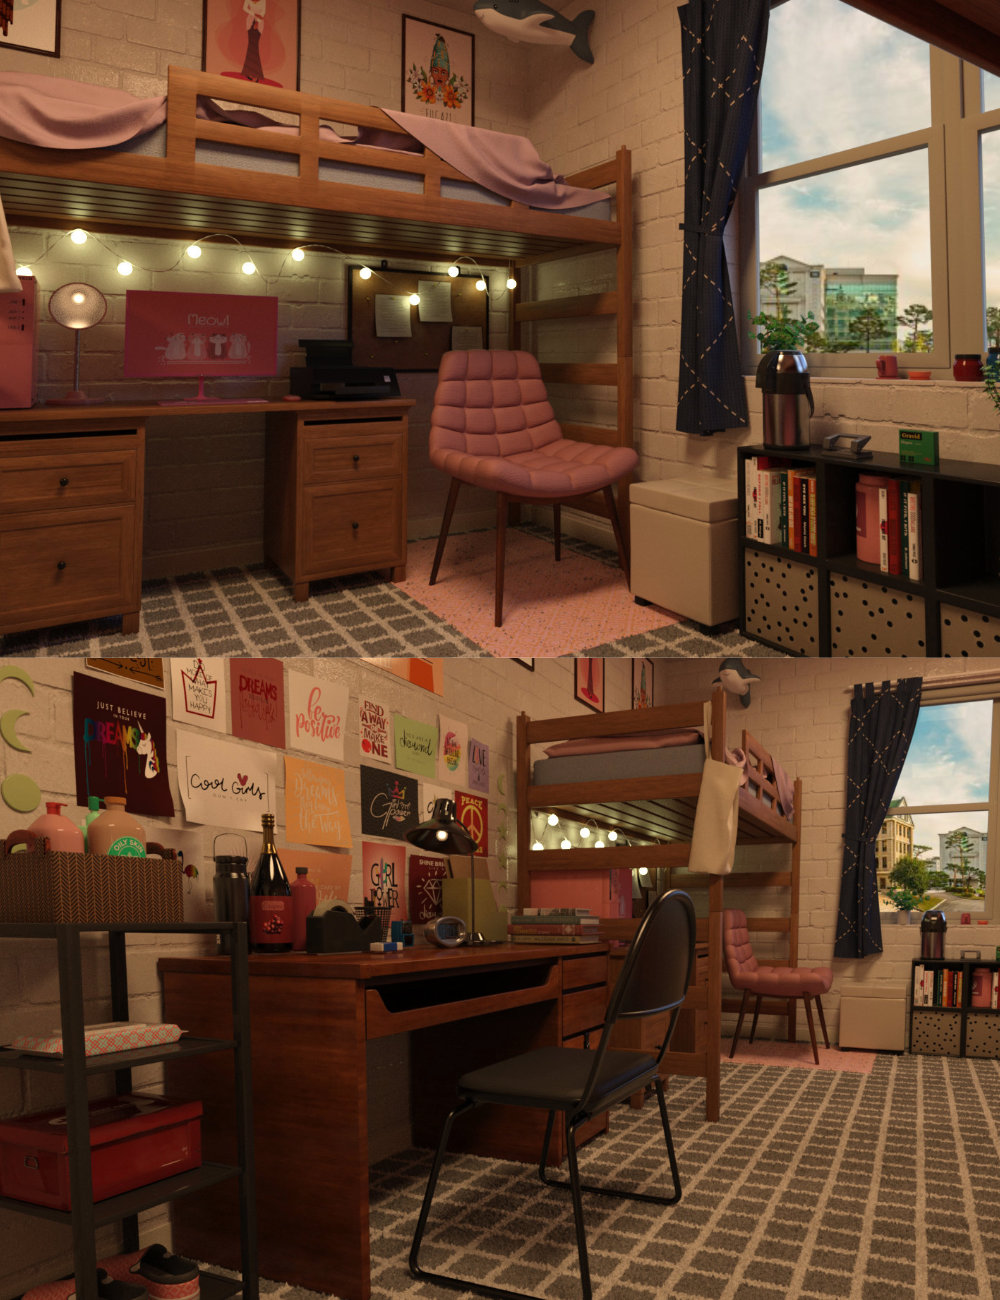 FG College Dormitory by: IronmanFugazi1968, 3D Models by Daz 3D